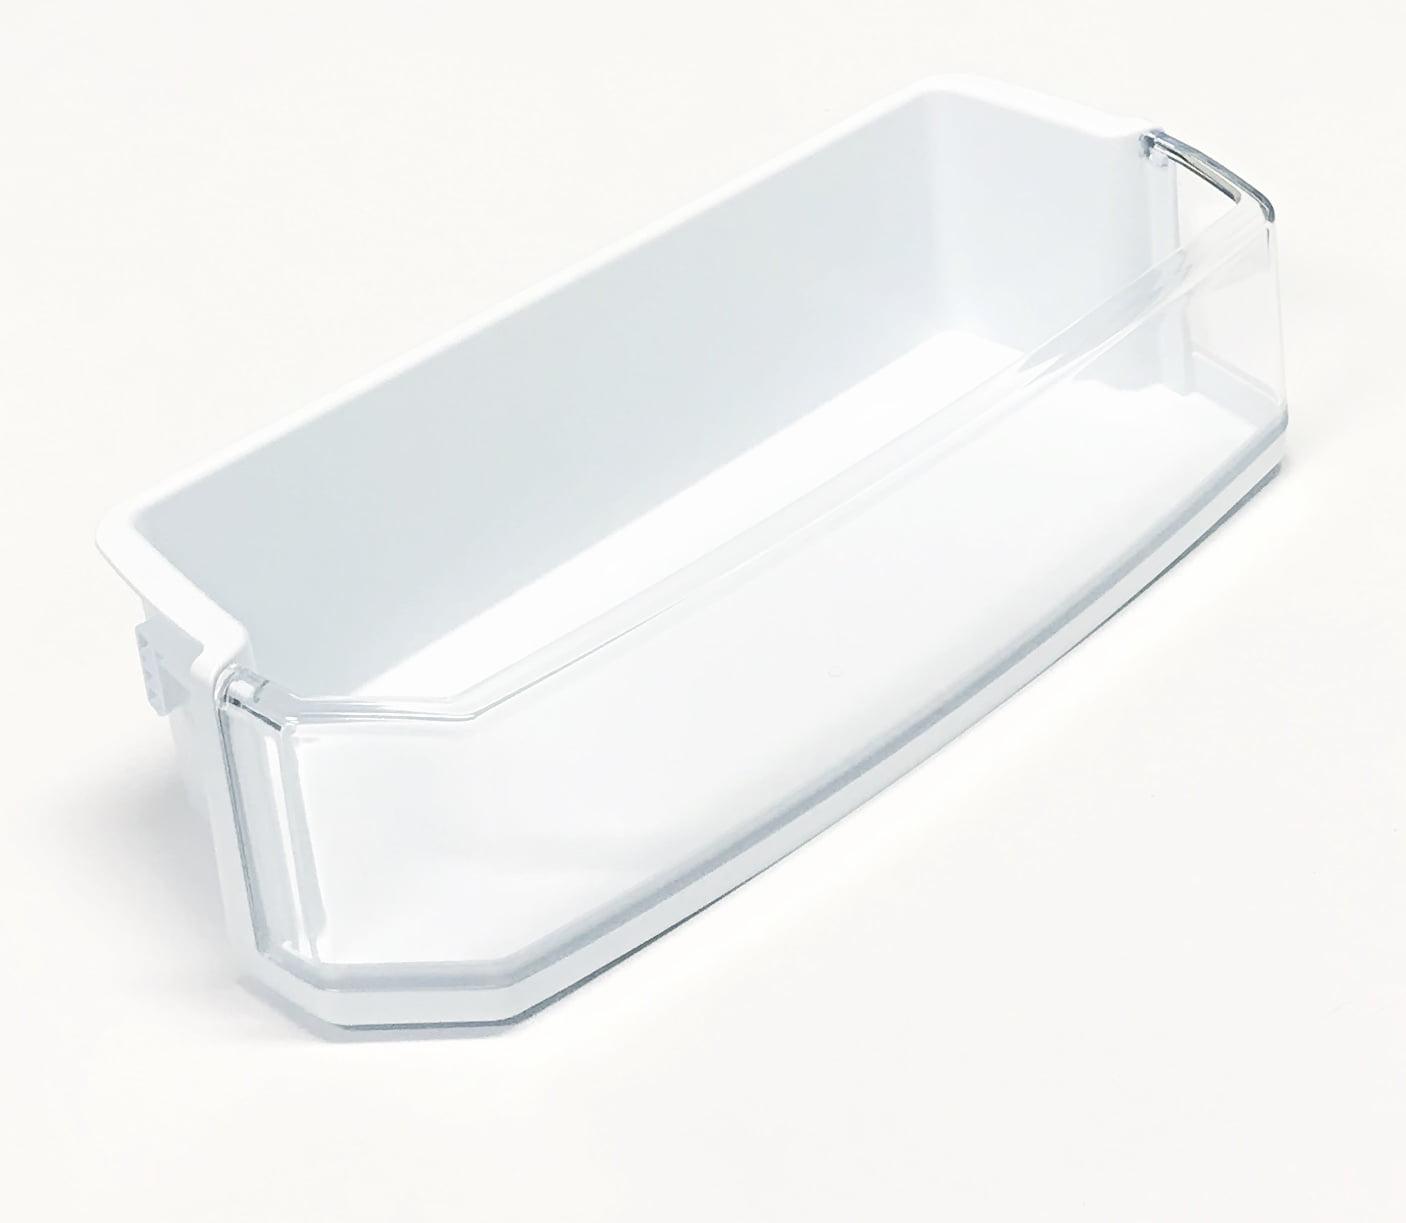 LBC24360SW OEM LG Refrigerator Door Bin Basket Shelf Tray For LDC24370ST LDCS24223S